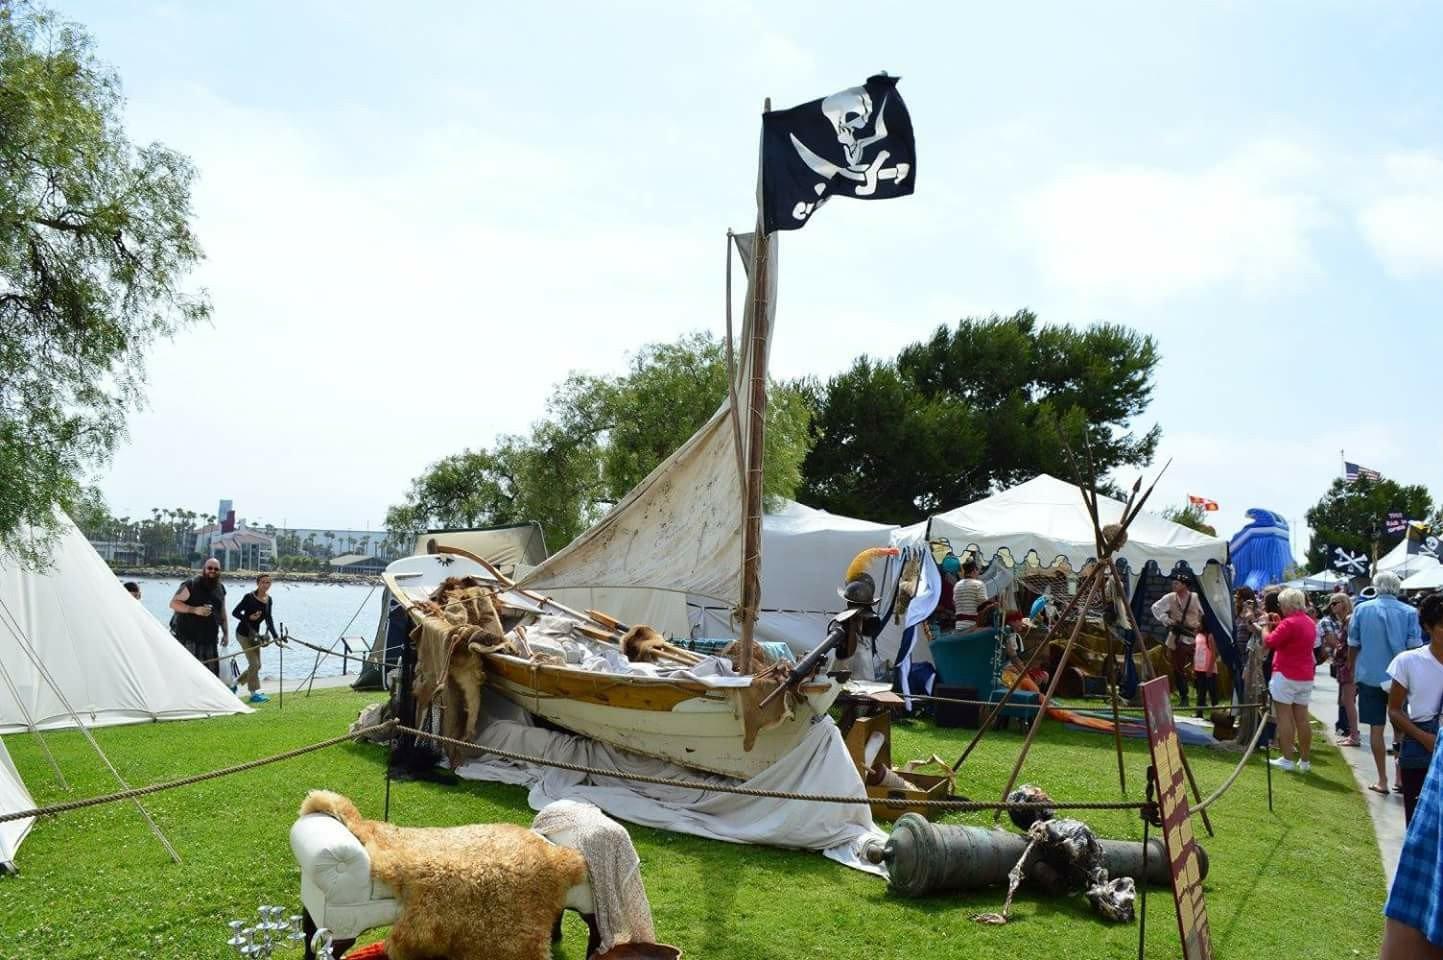 pirate invasion long beach